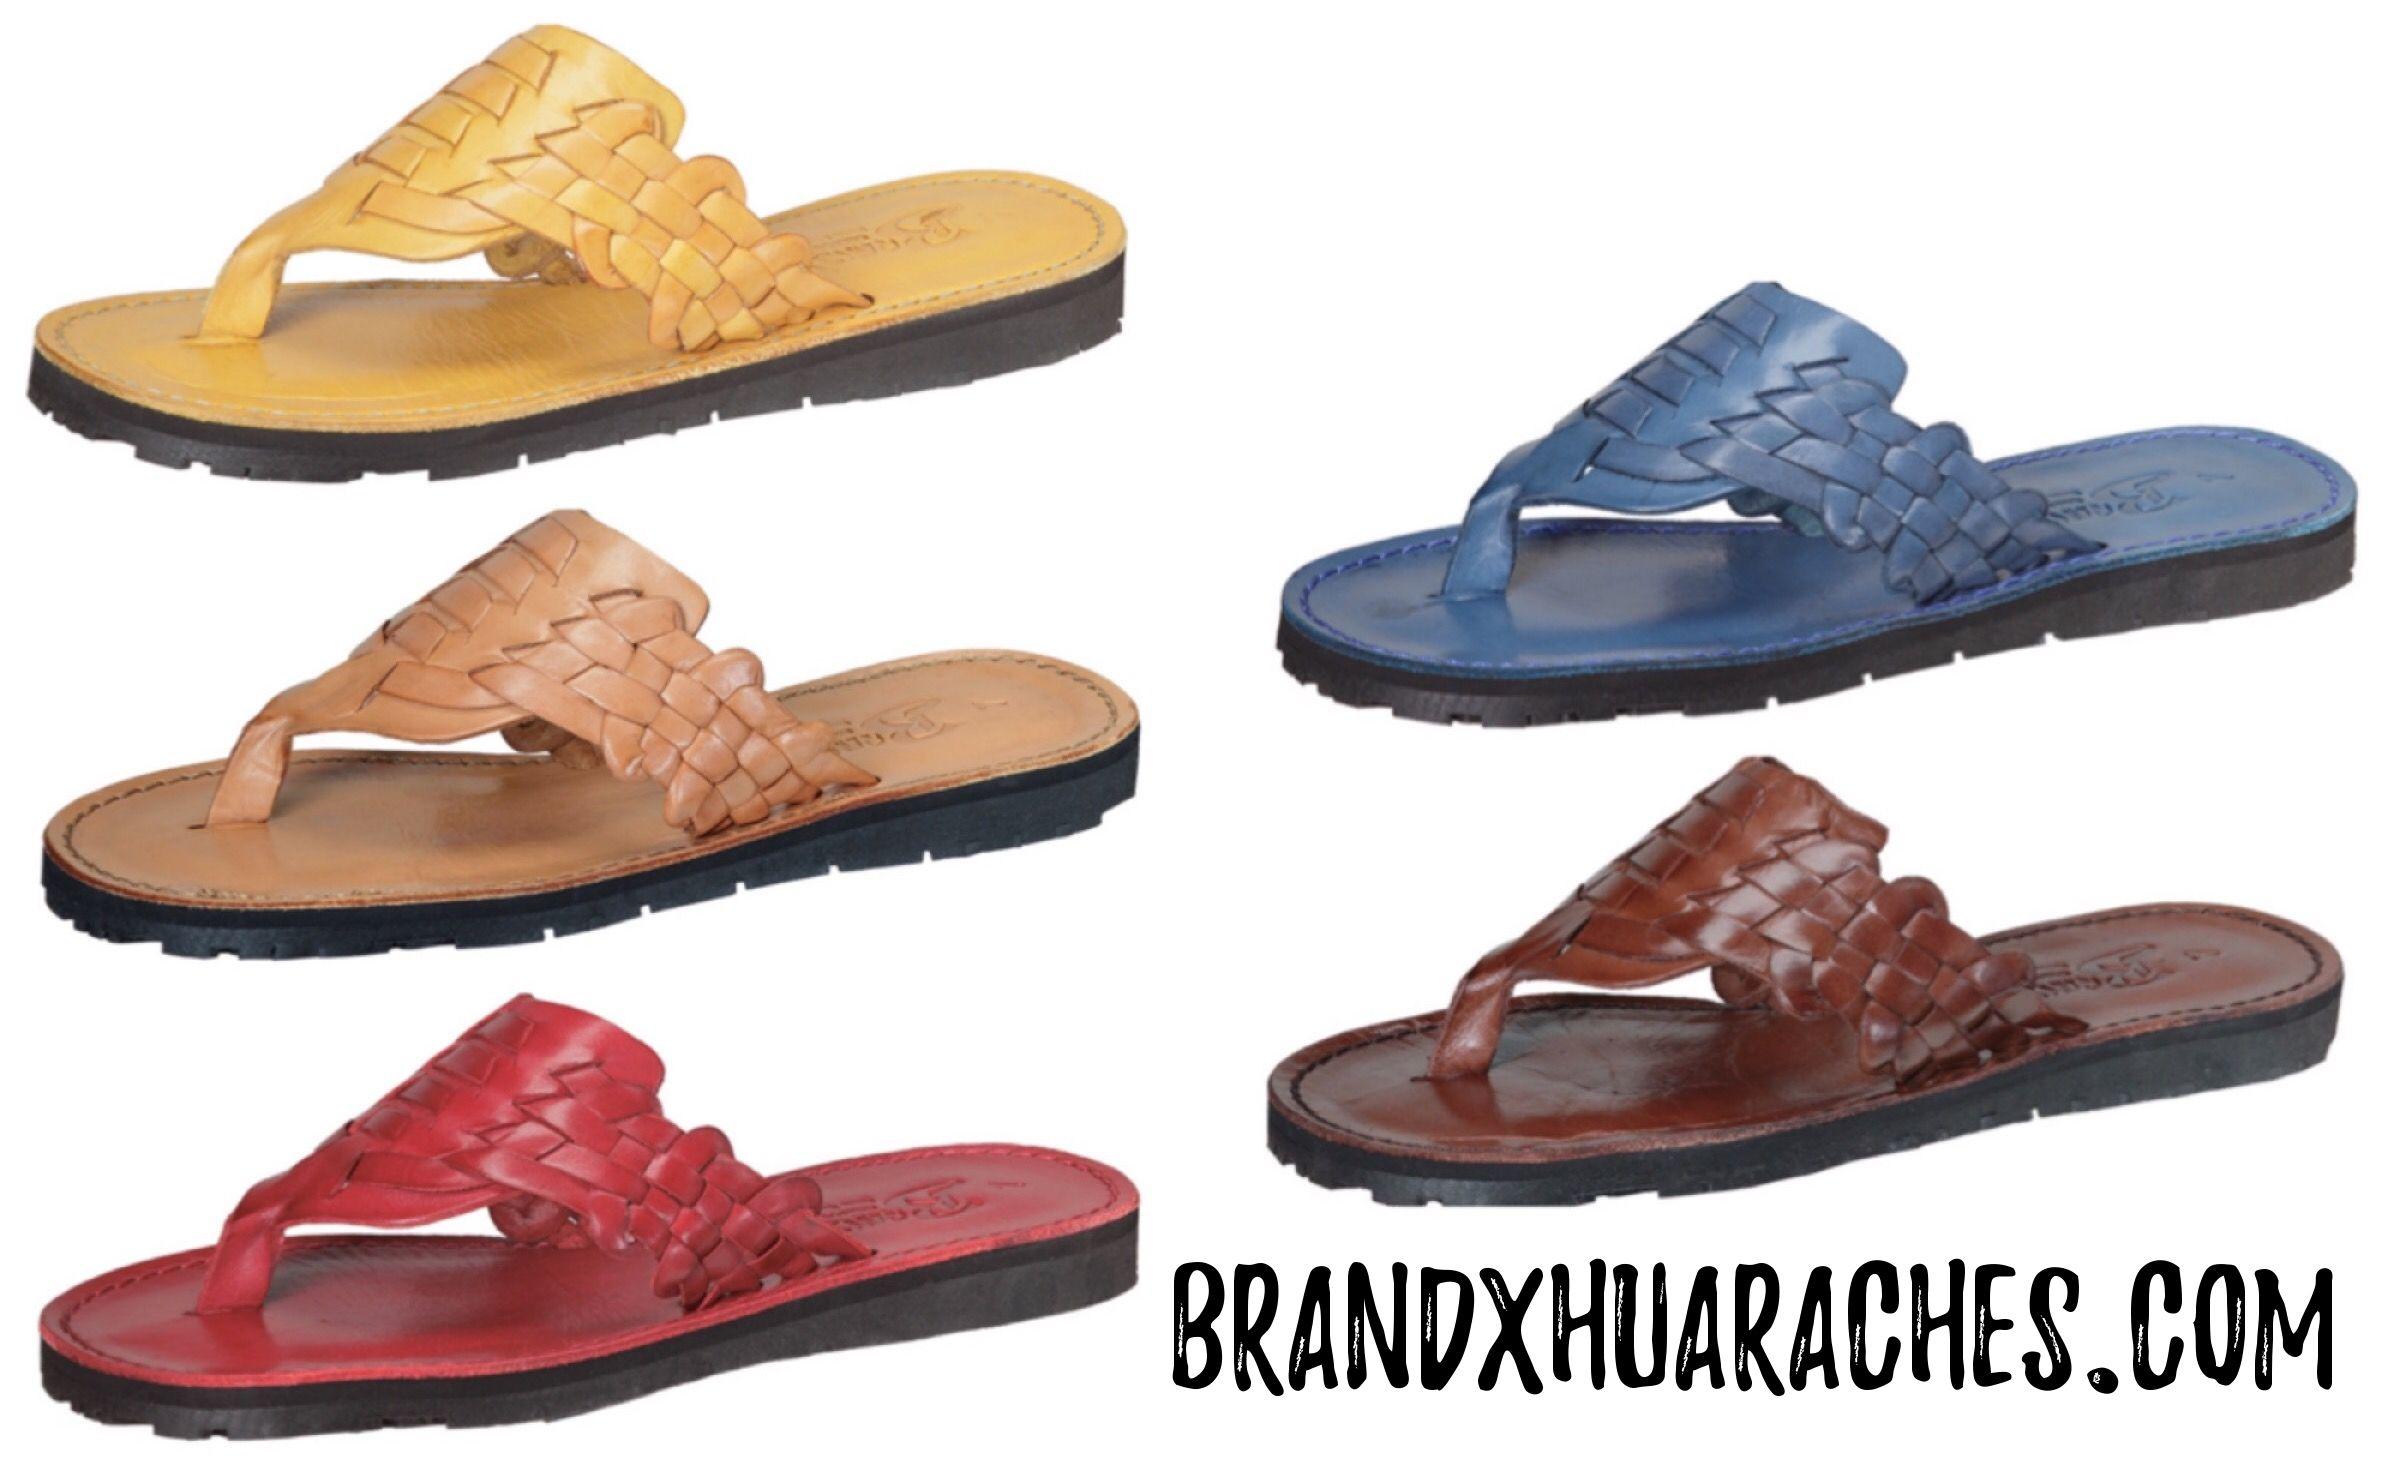 most best comforter women picks men flip sandal trail sandals z xero for hiking shoes flops comfortable